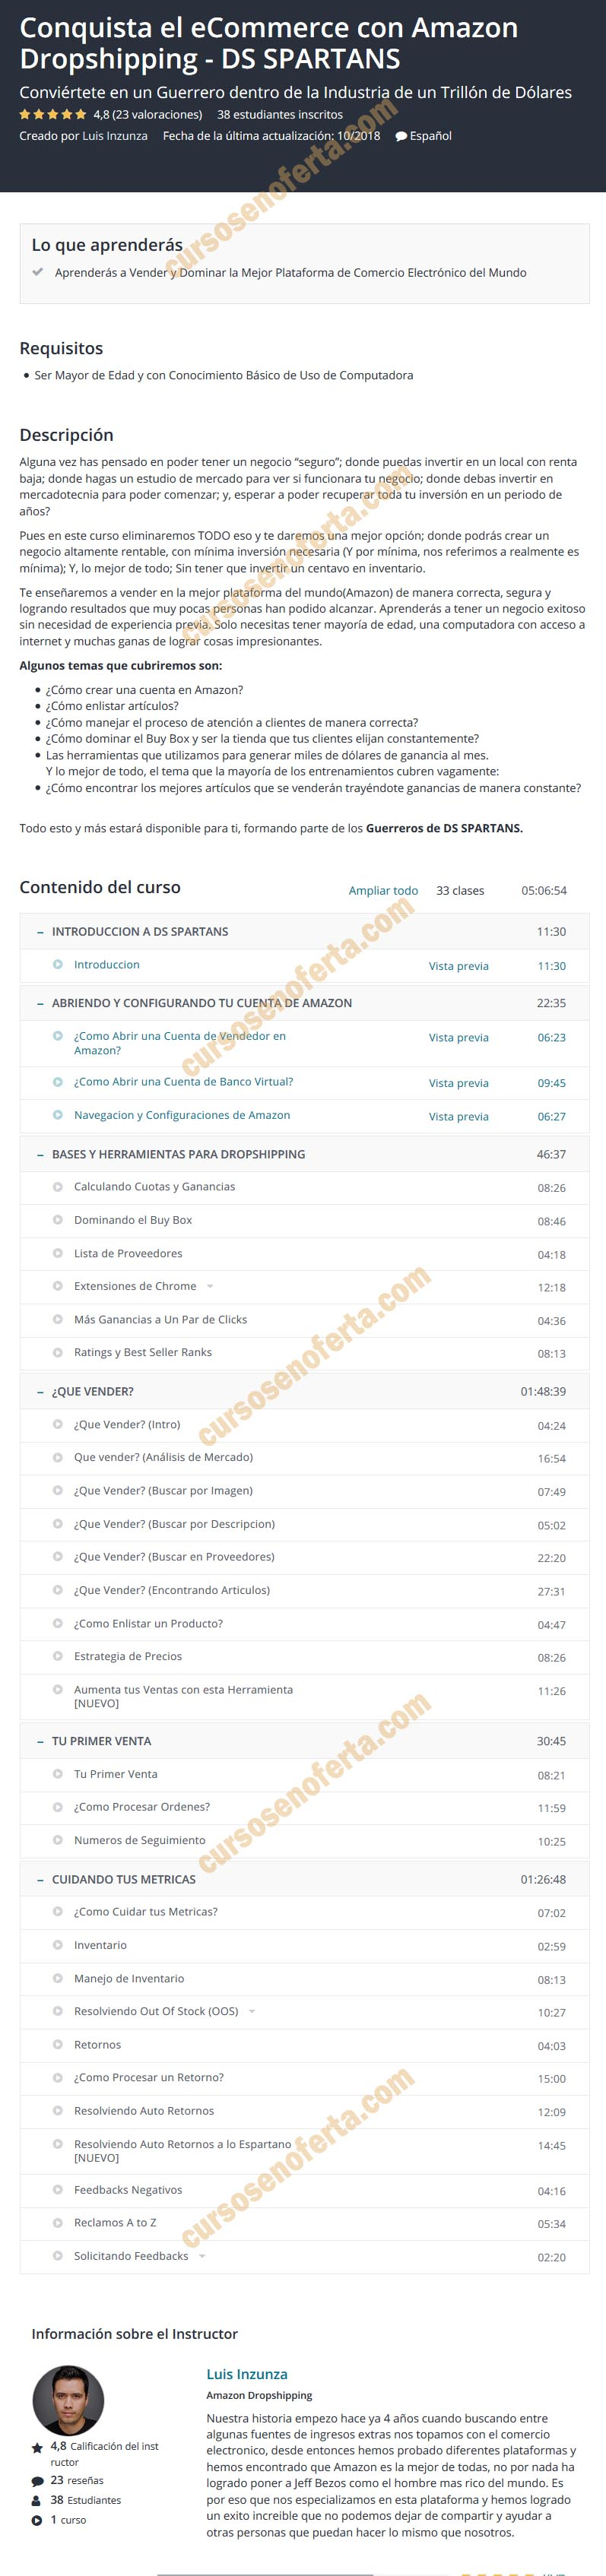 Conquista el eCommerce con Amazon Dropshipping - DS SPARTANS